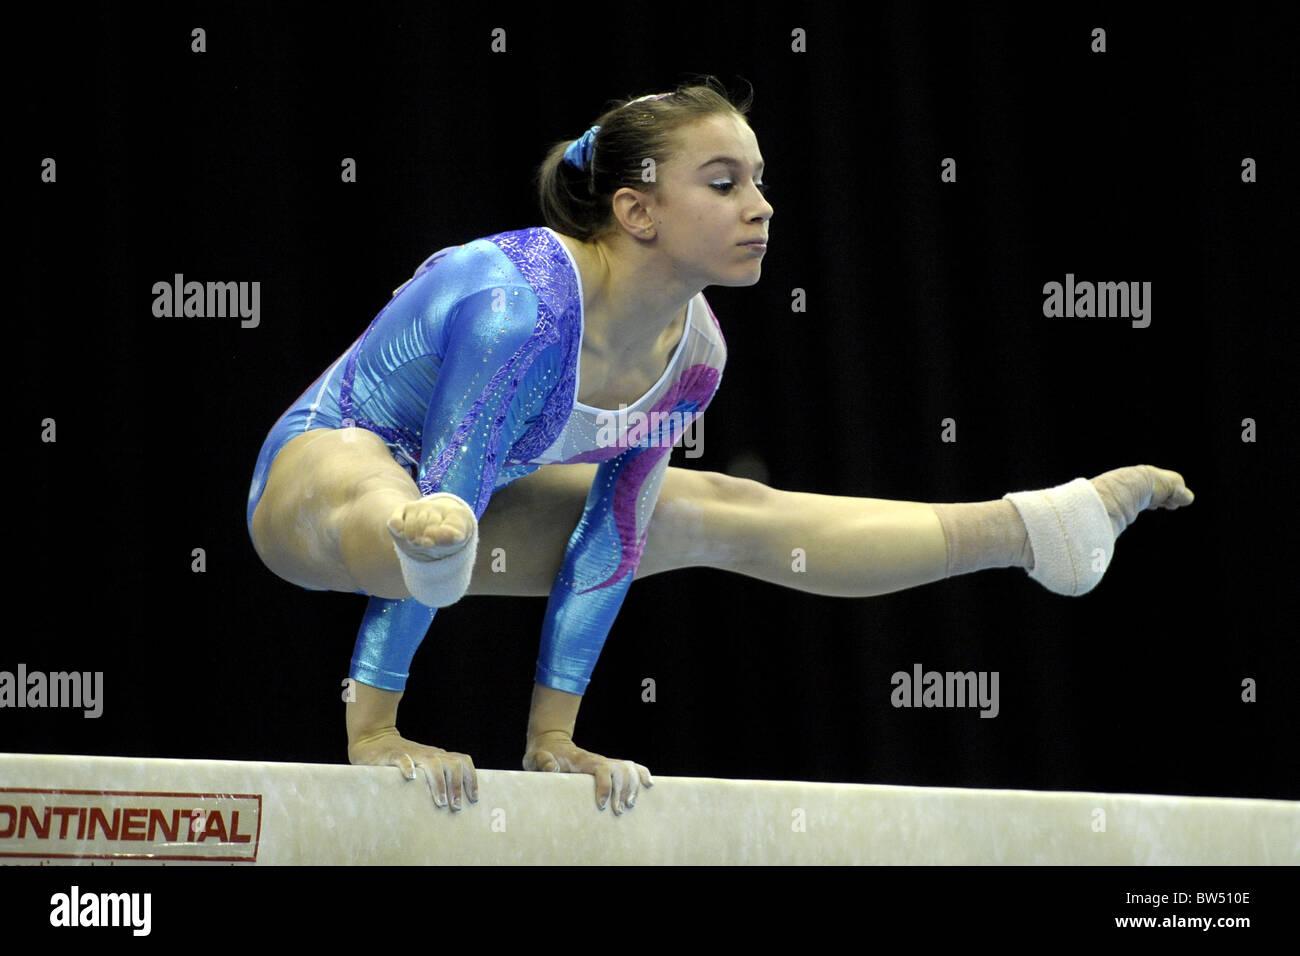 30.4.10 European Gymnastics Championships .Junior All Round Finals.FASANAErika of Italy on beam. - Stock Image